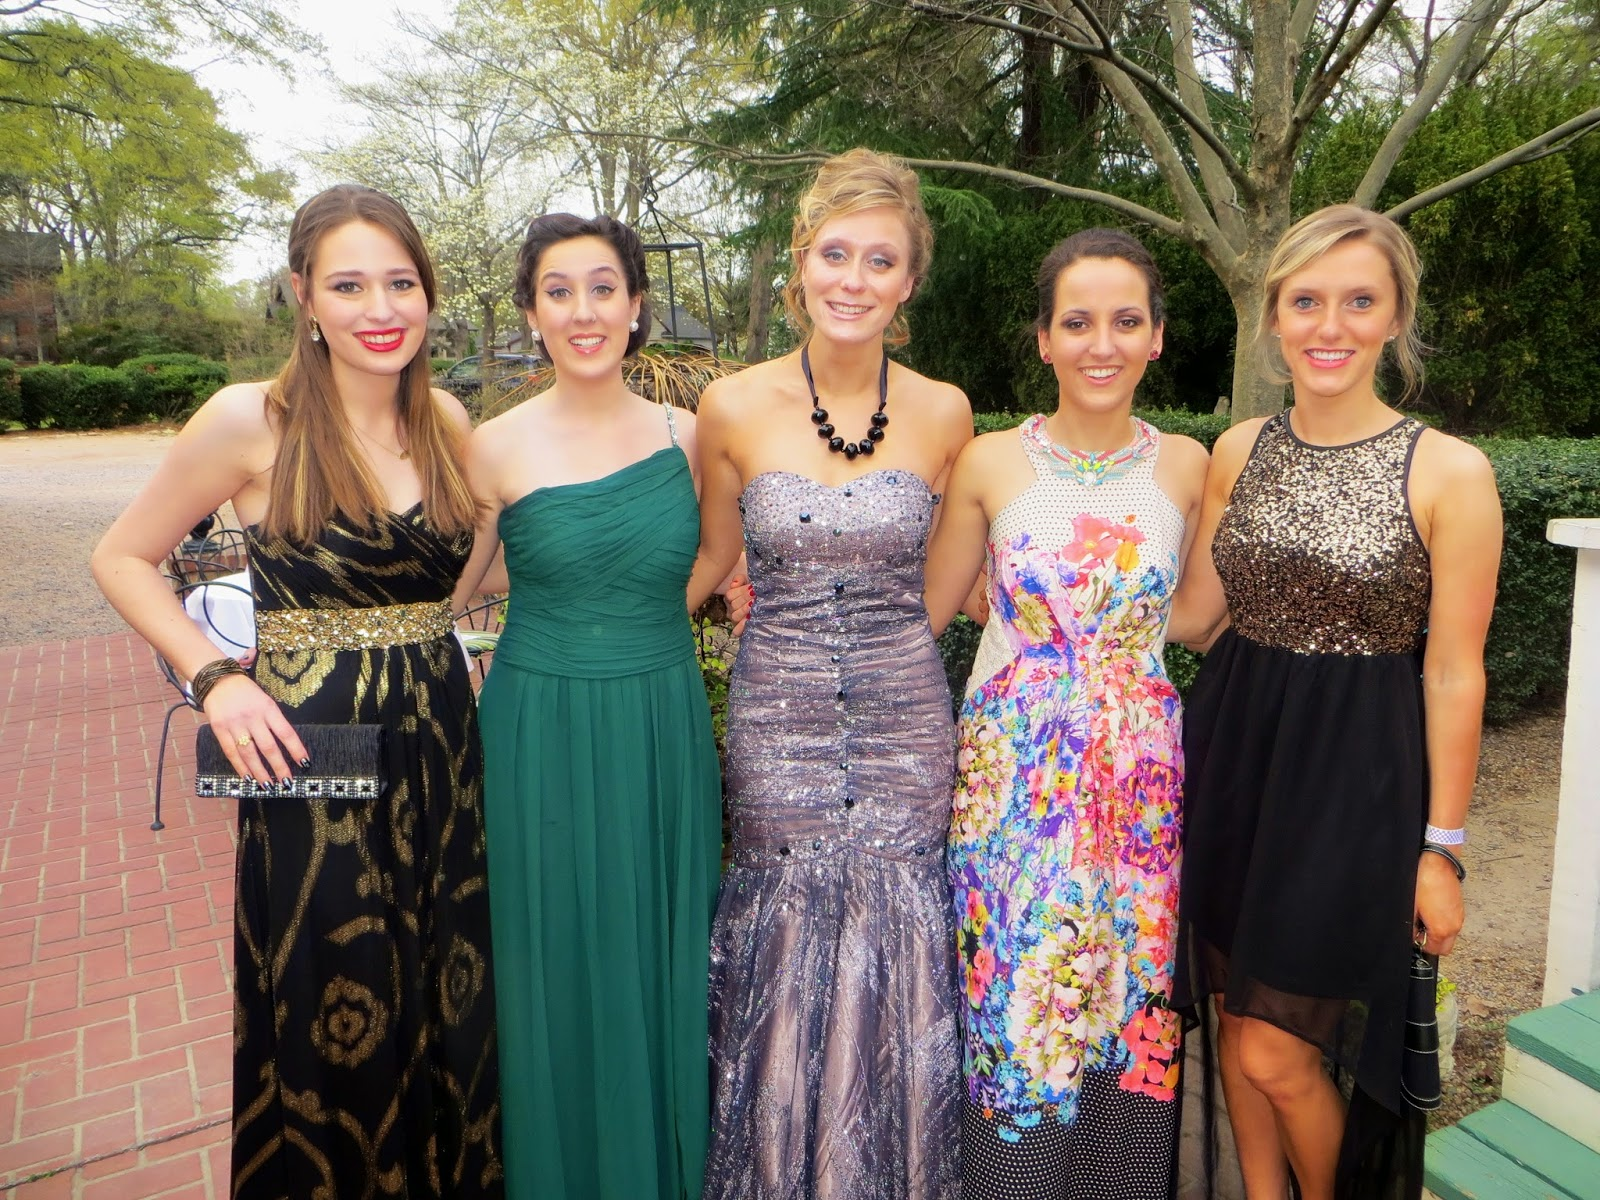 Semi Formal Dresses For Sorority Events Dress Images